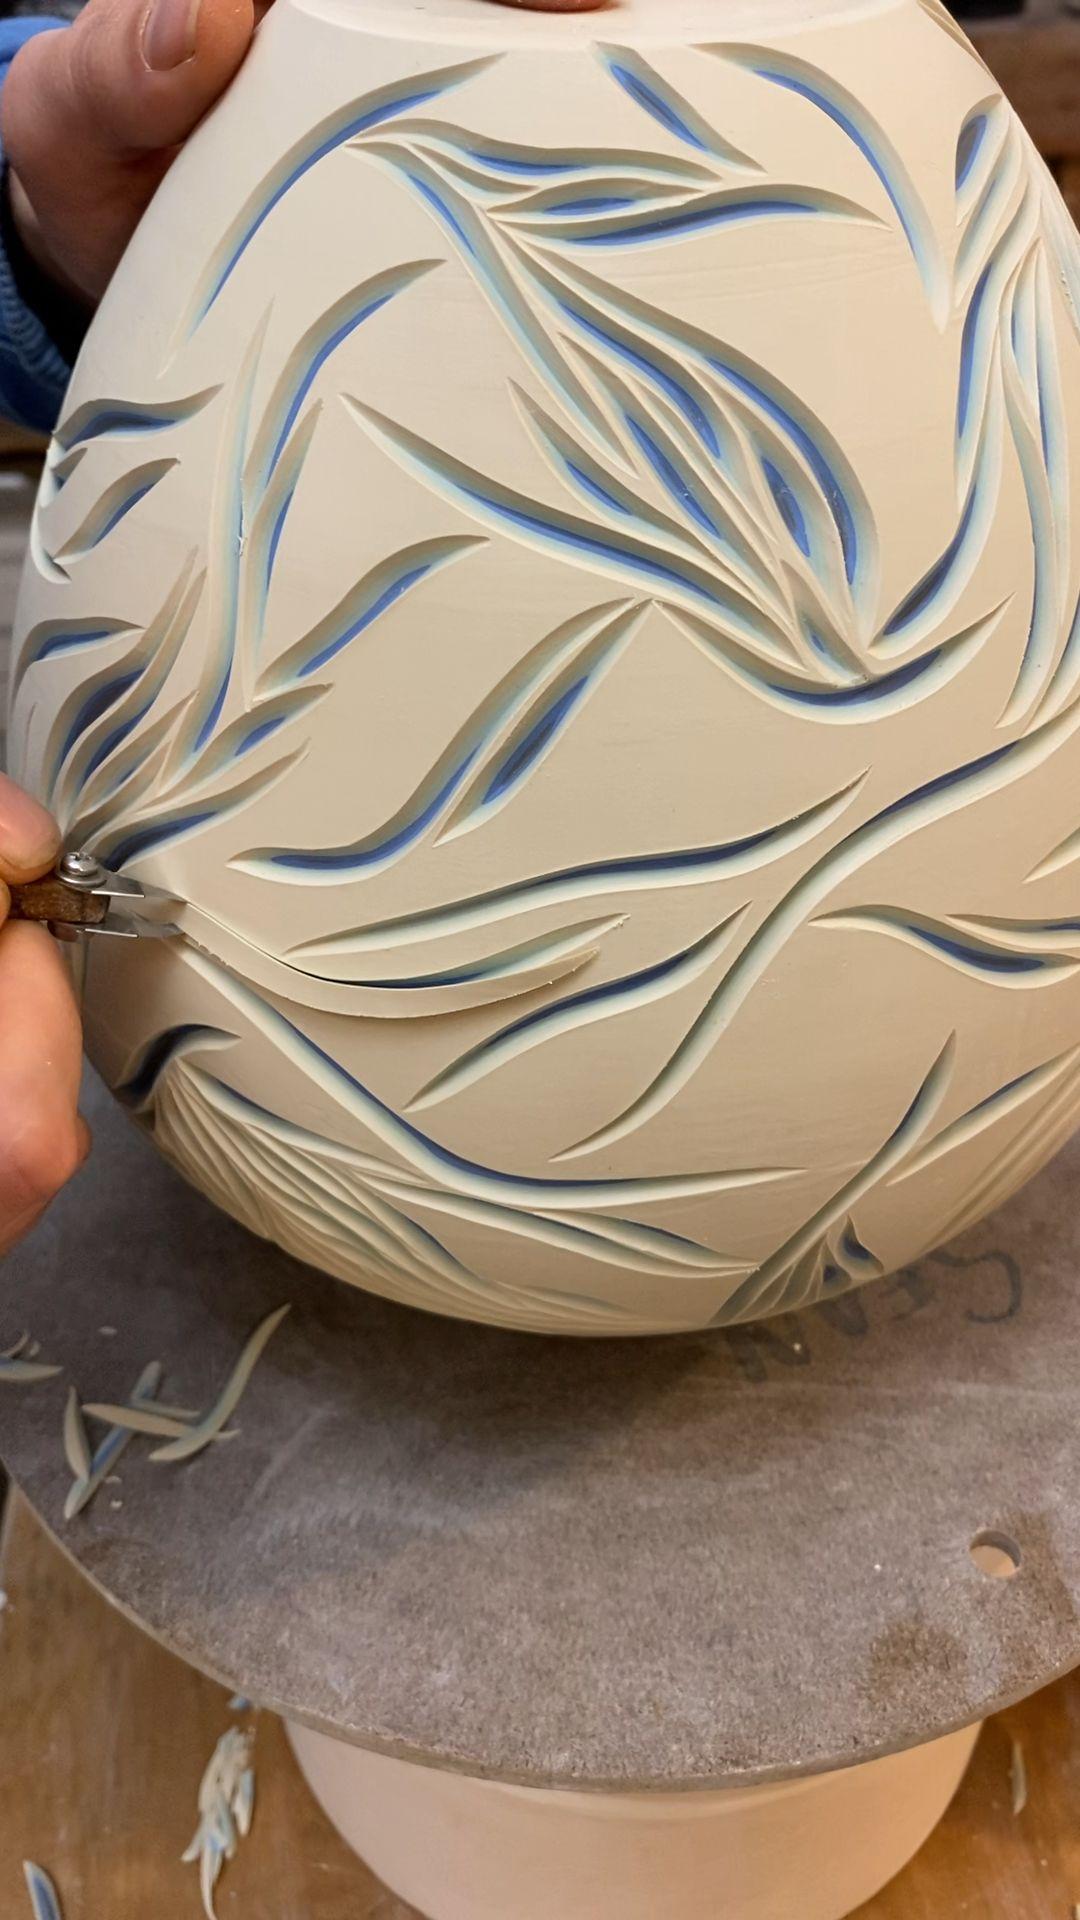 #porcelain #ceramics #interiordecor #flowervases #vase #handmade #asmr #satisfying